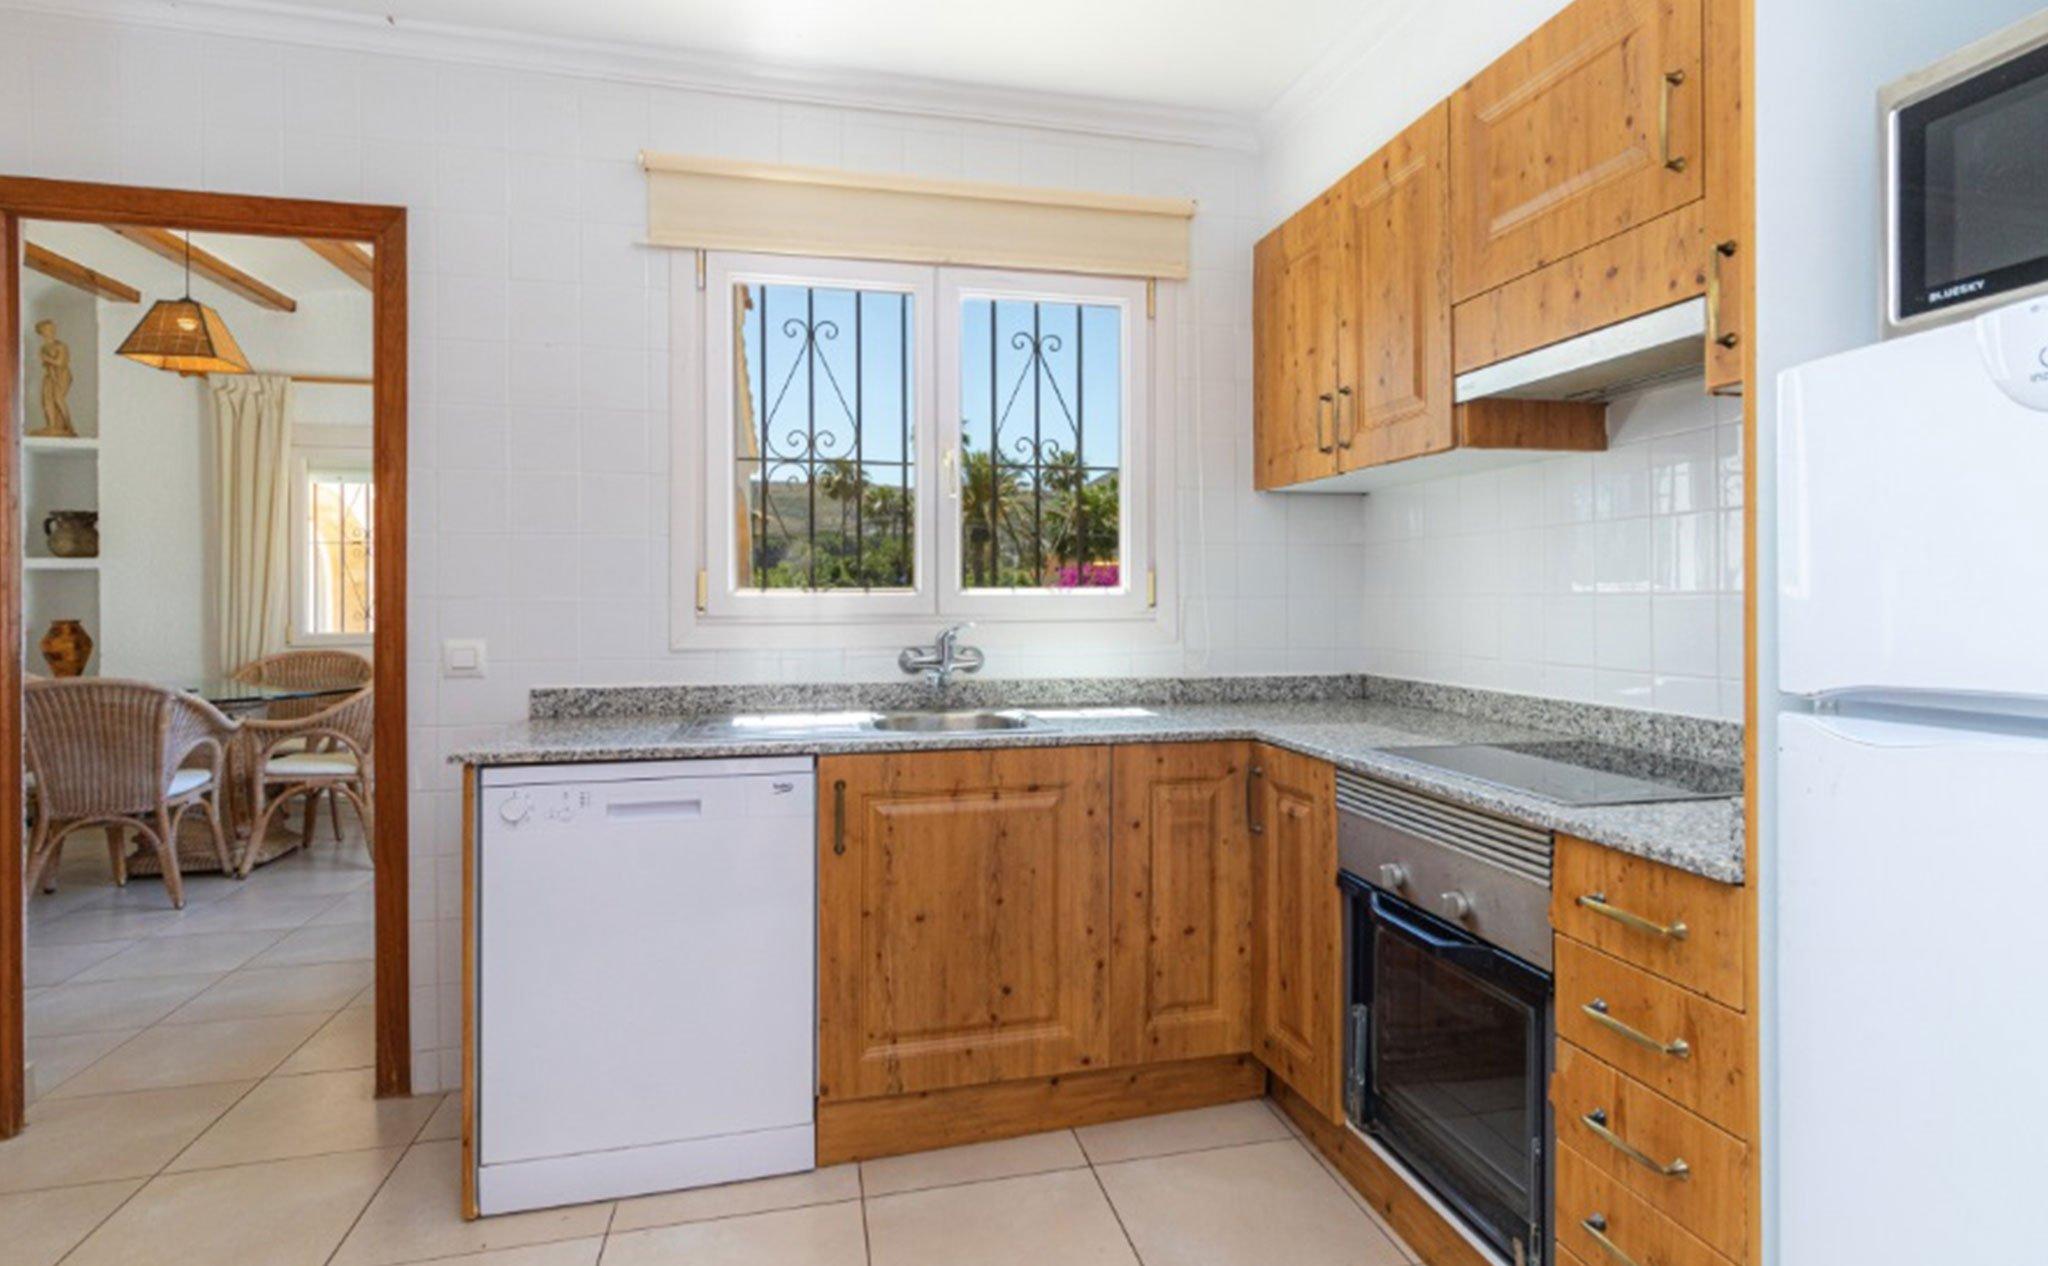 Cocina equipada un chalet en venta en Jávea – Vicens Ash Properties